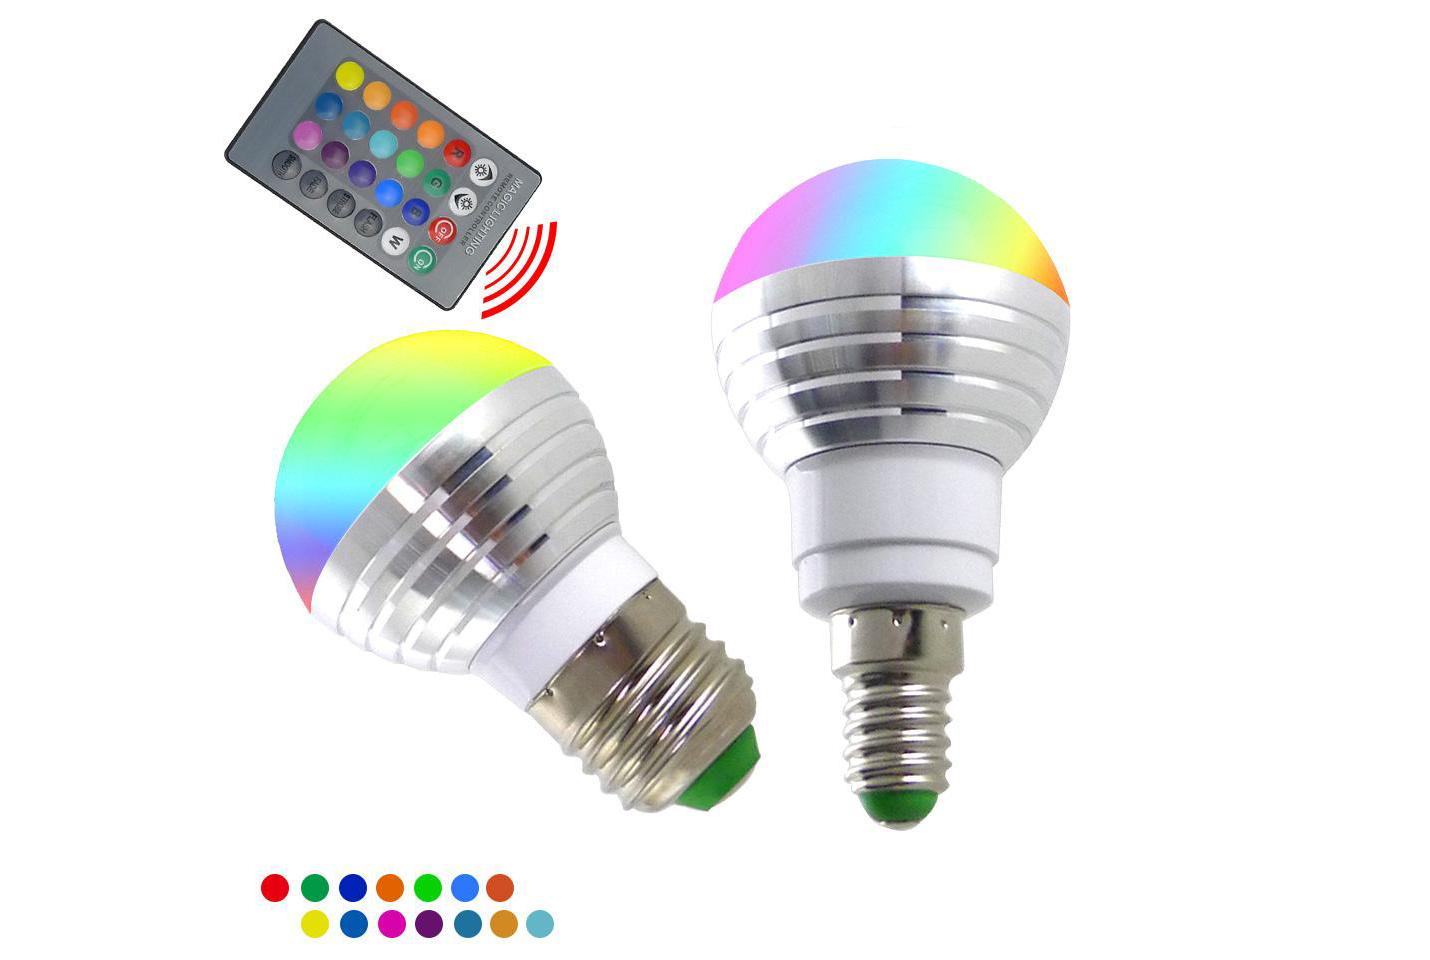 Gekleurde RGB ledlampen   ActievandeDag